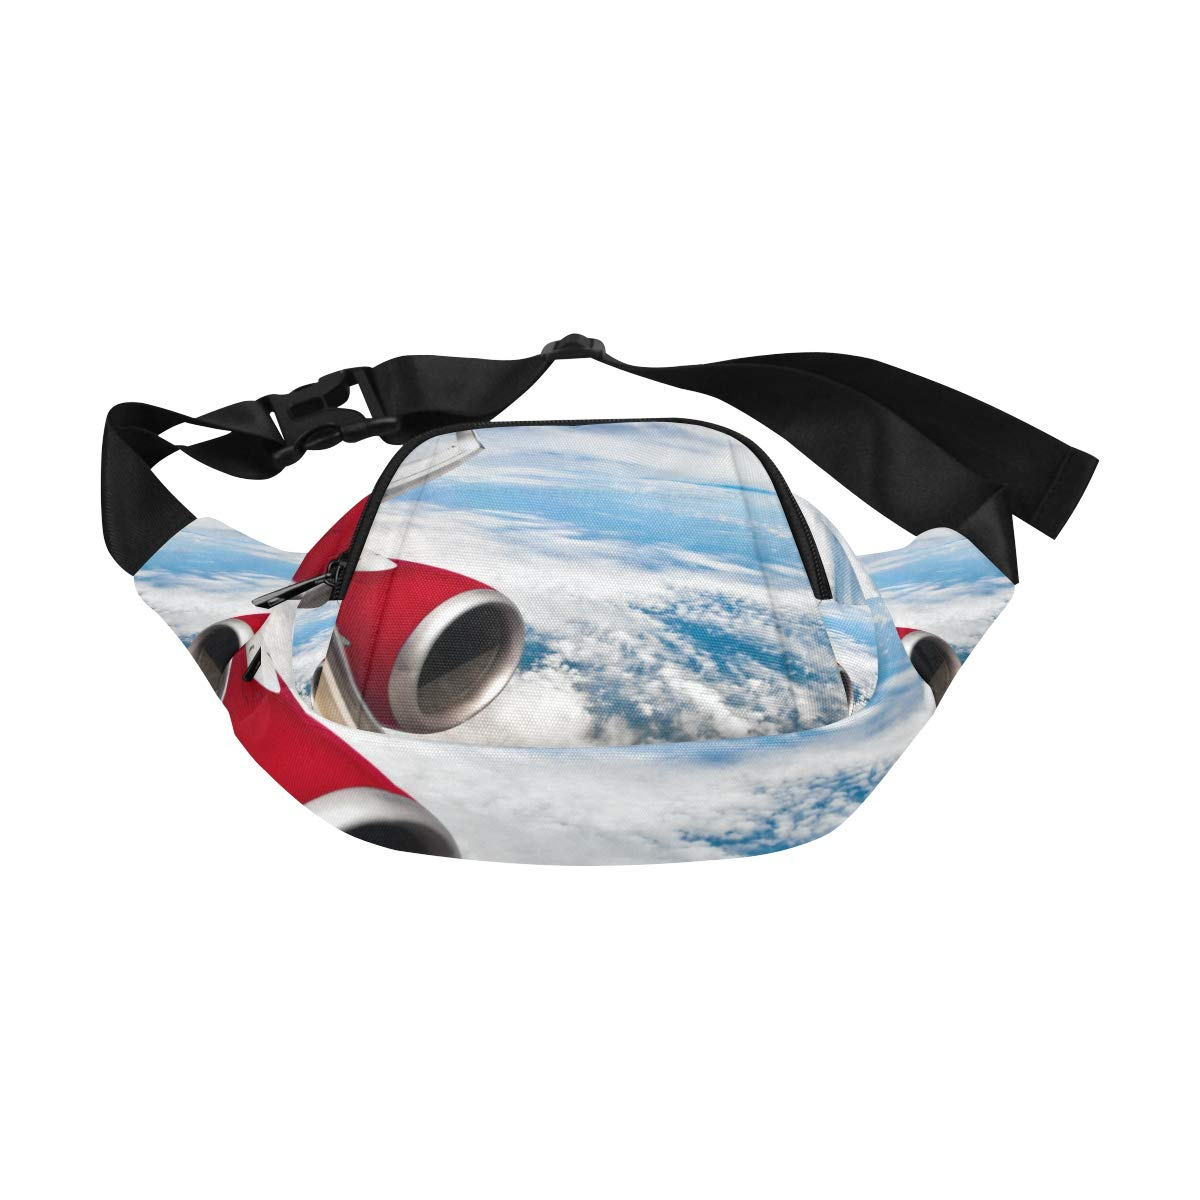 Passenger Aircraft Turbine Waiting To Leave Fenny Packs Waist Bags Adjustable Belt Waterproof Nylon Travel Running Sport Vacation Party For Men Women Boys Girls Kids